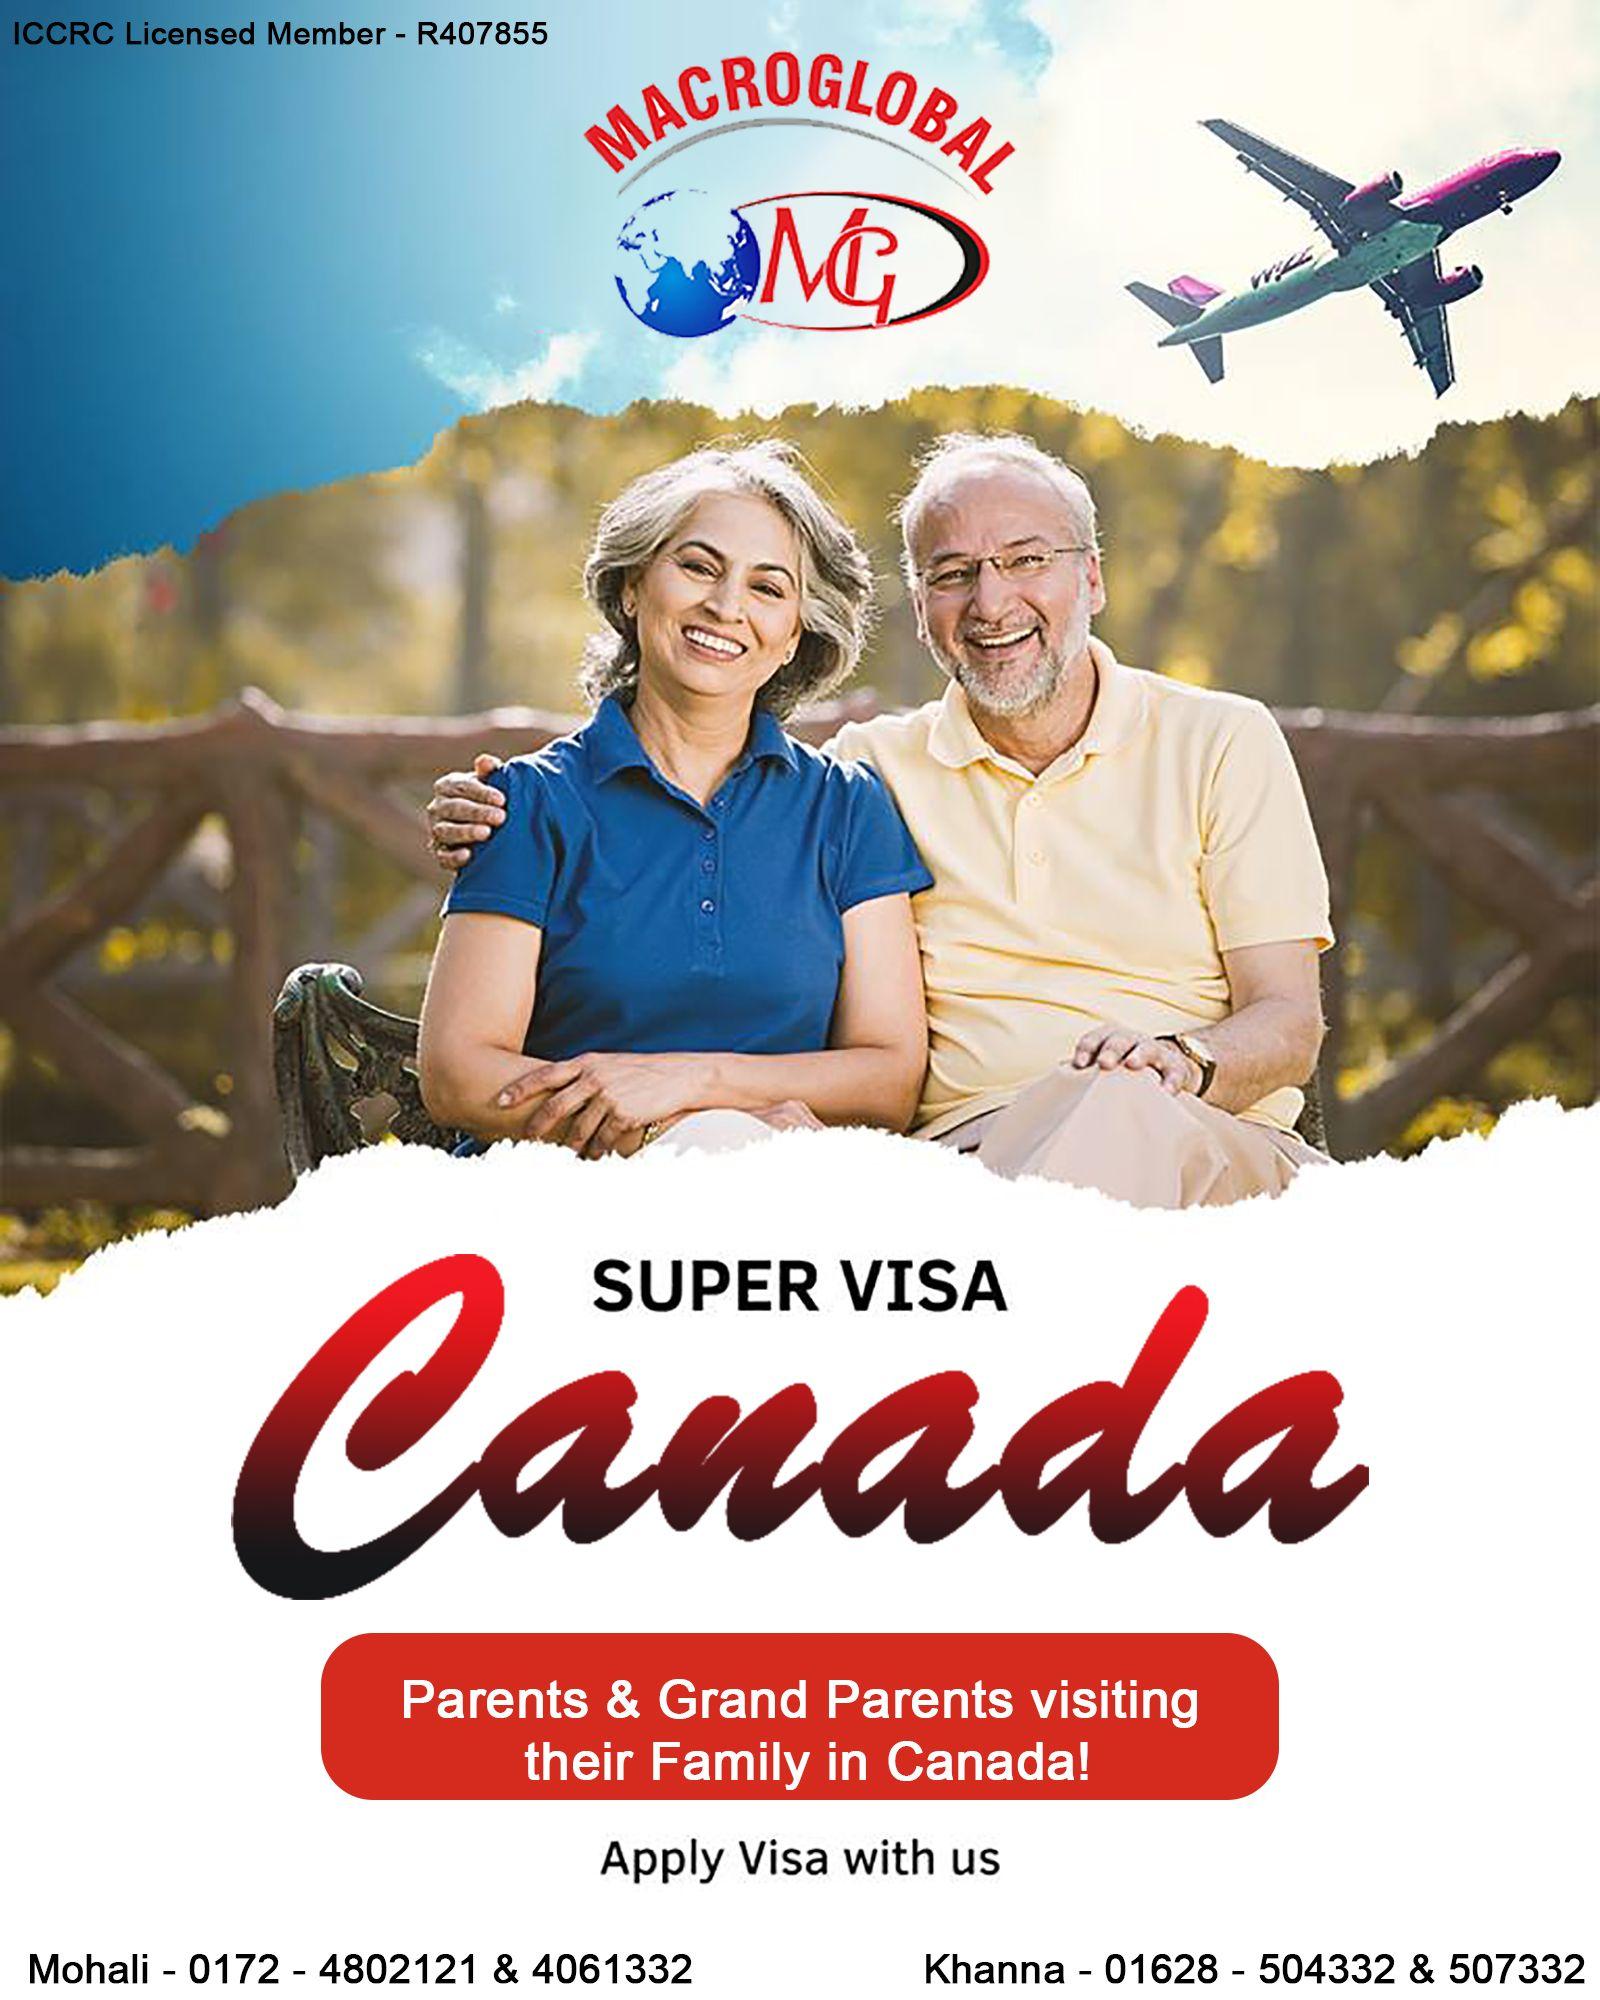 Get Super visa for your grandparents and make them settle